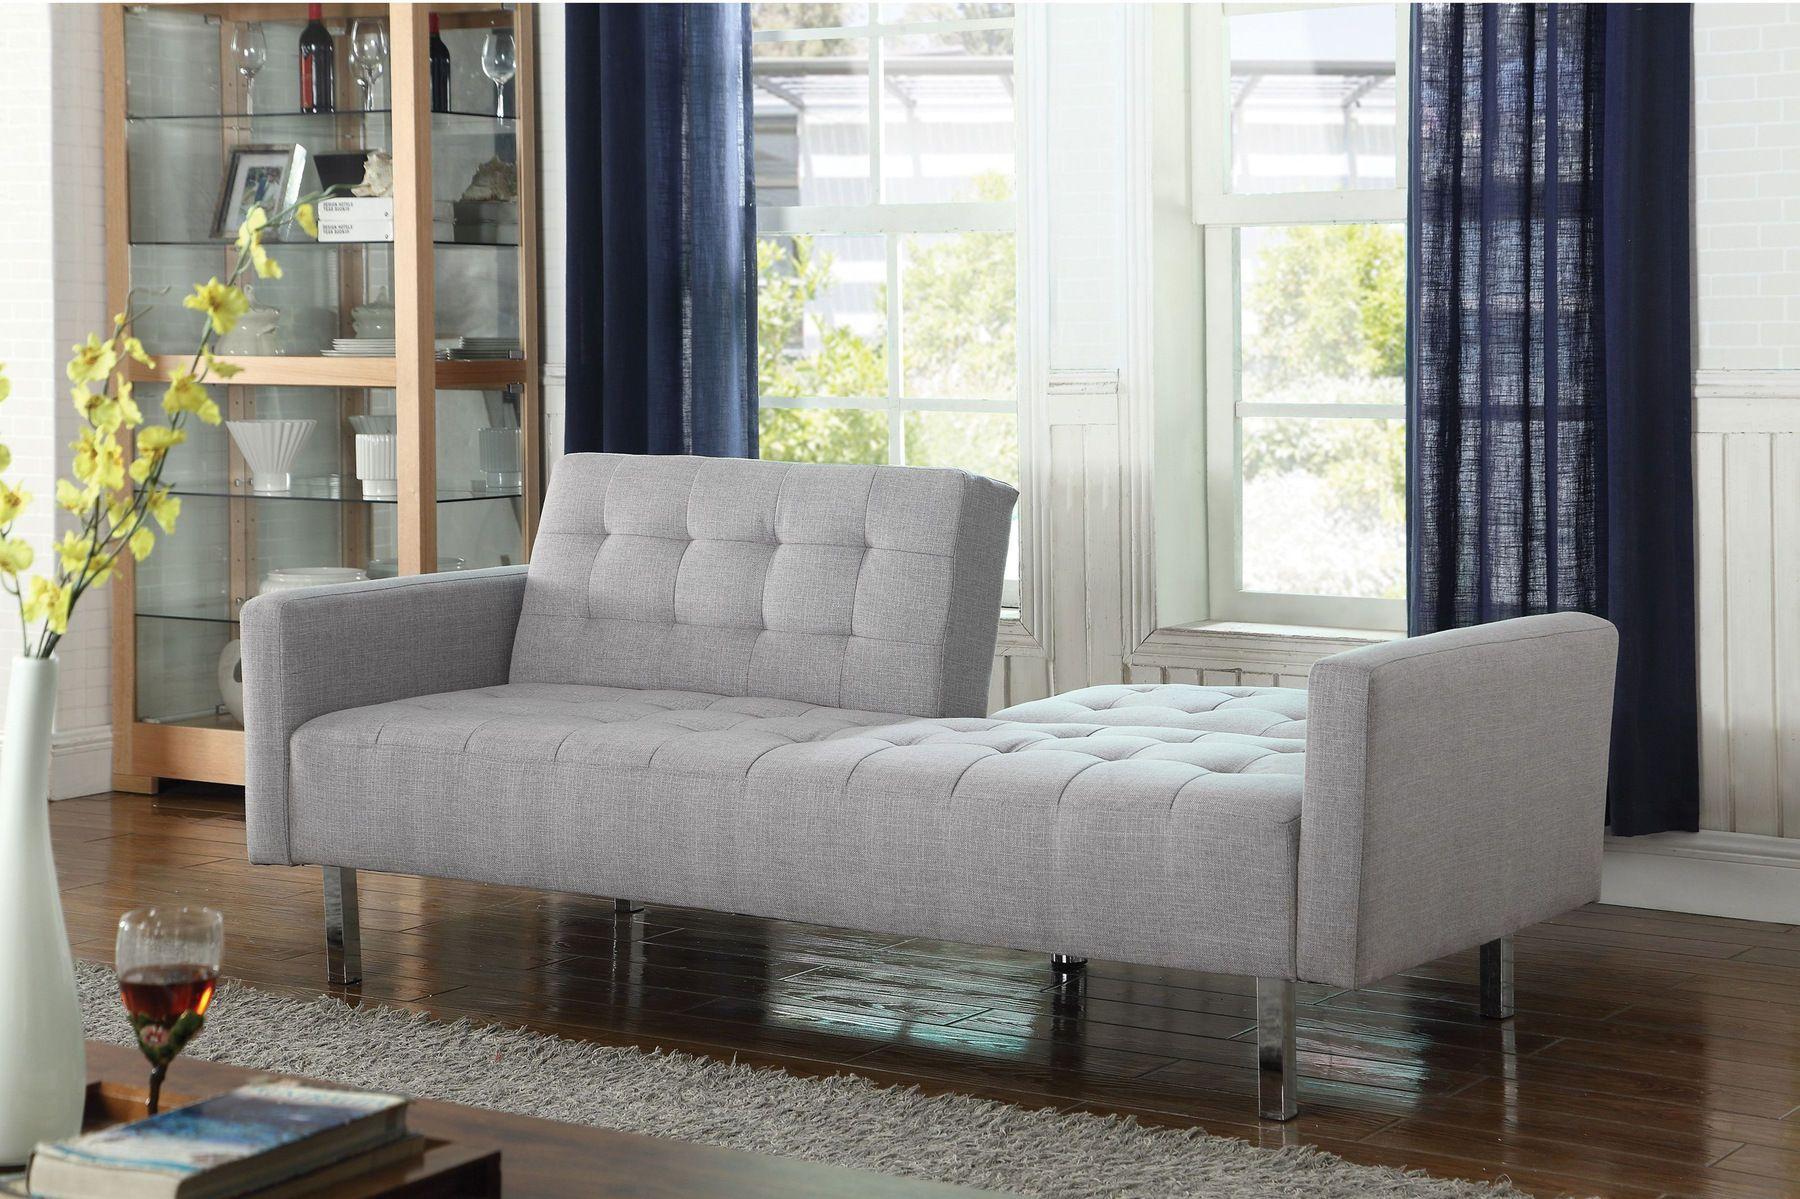 Cs616 Sofa Bed 505616 Coaster Furniture Sleeper Sofas Sofa Bed Fabric Sofa Bed Sofa